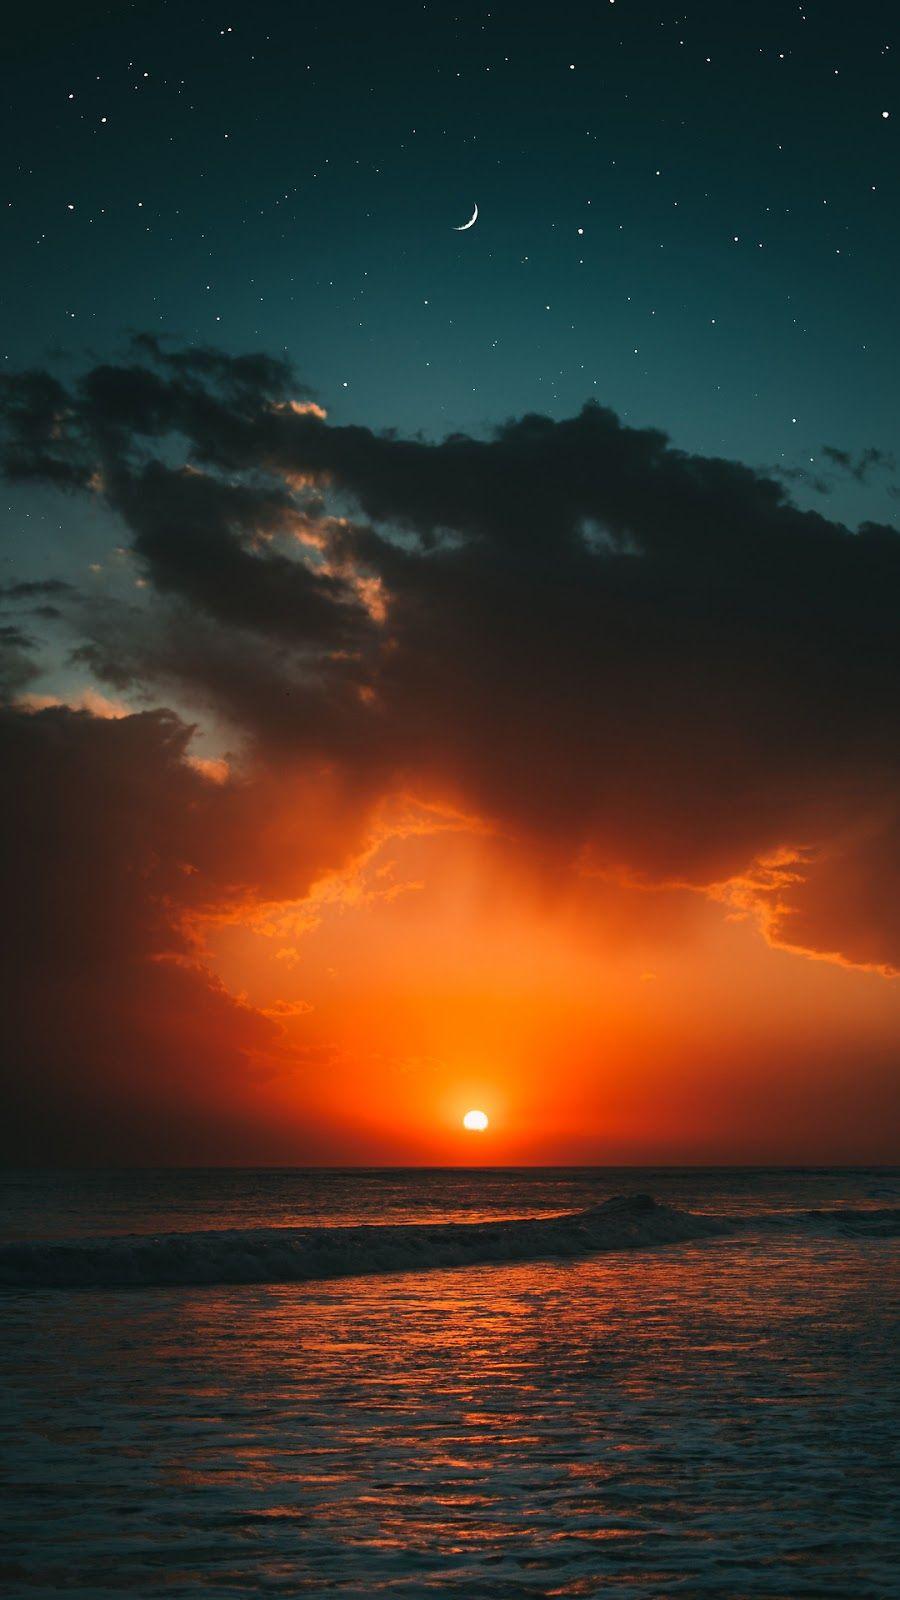 Sunset beach wallpaper orange Atardecer cielo Puestas de sol 900x1600